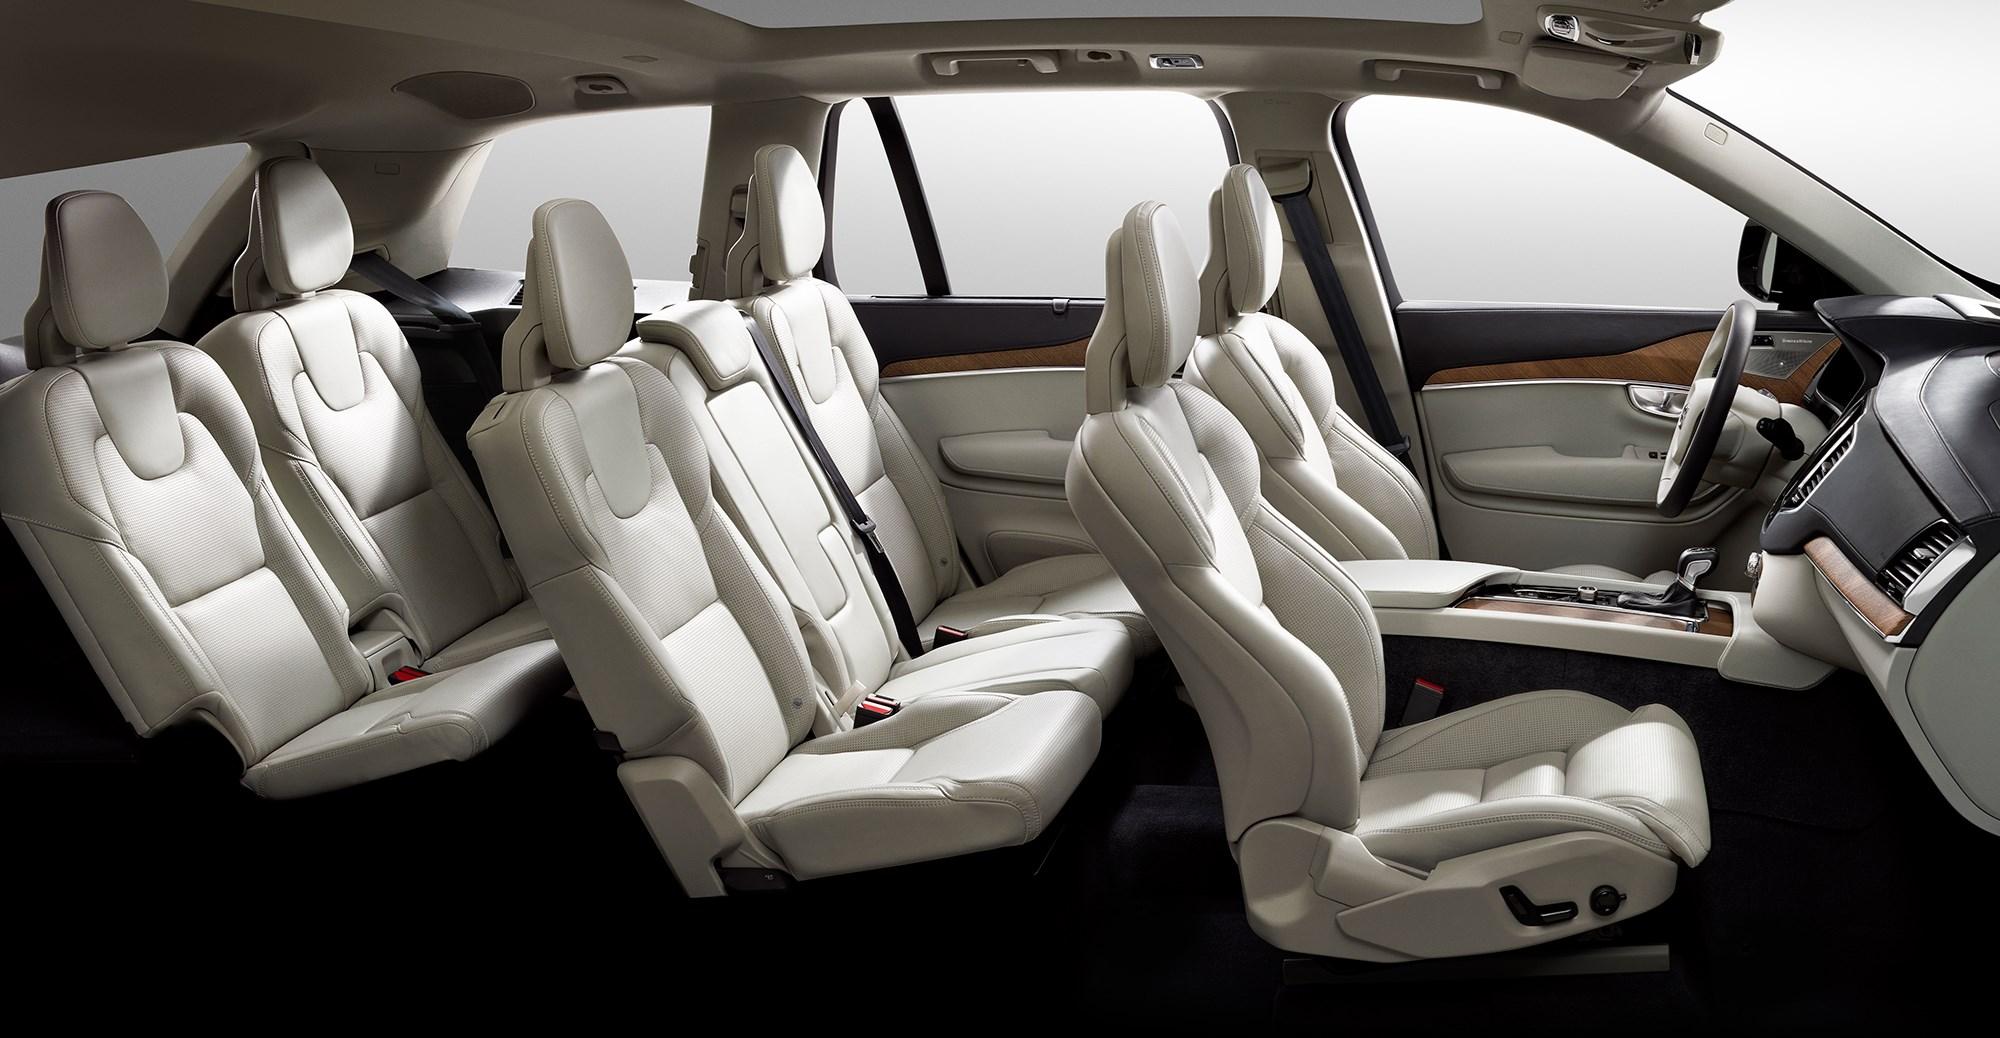 Volvo XC90 D5 (2015) review | CAR Magazine